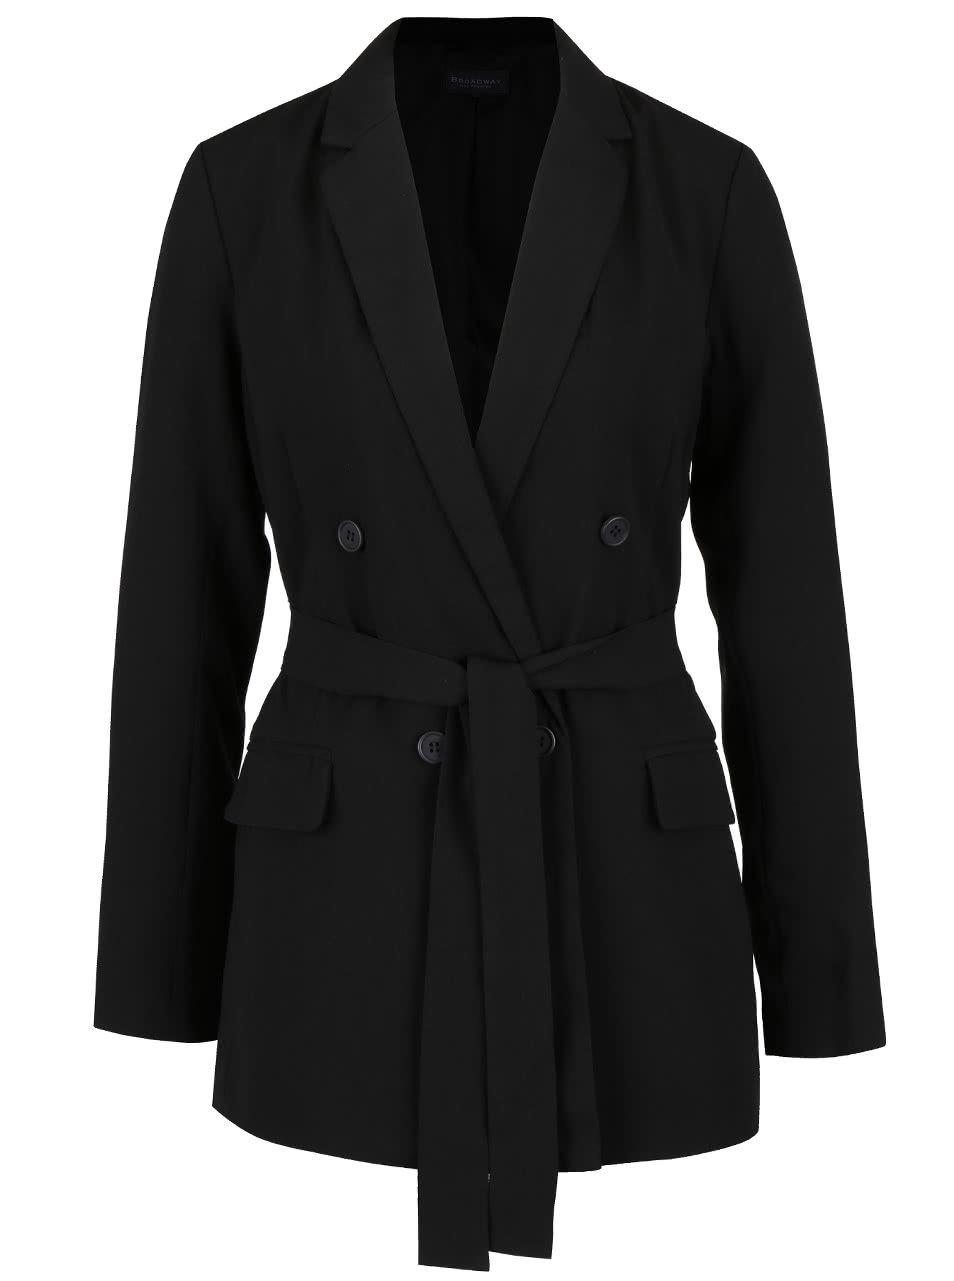 Čierny dámsky kabát s opaskom Broadway Noela ... 095517ff79c